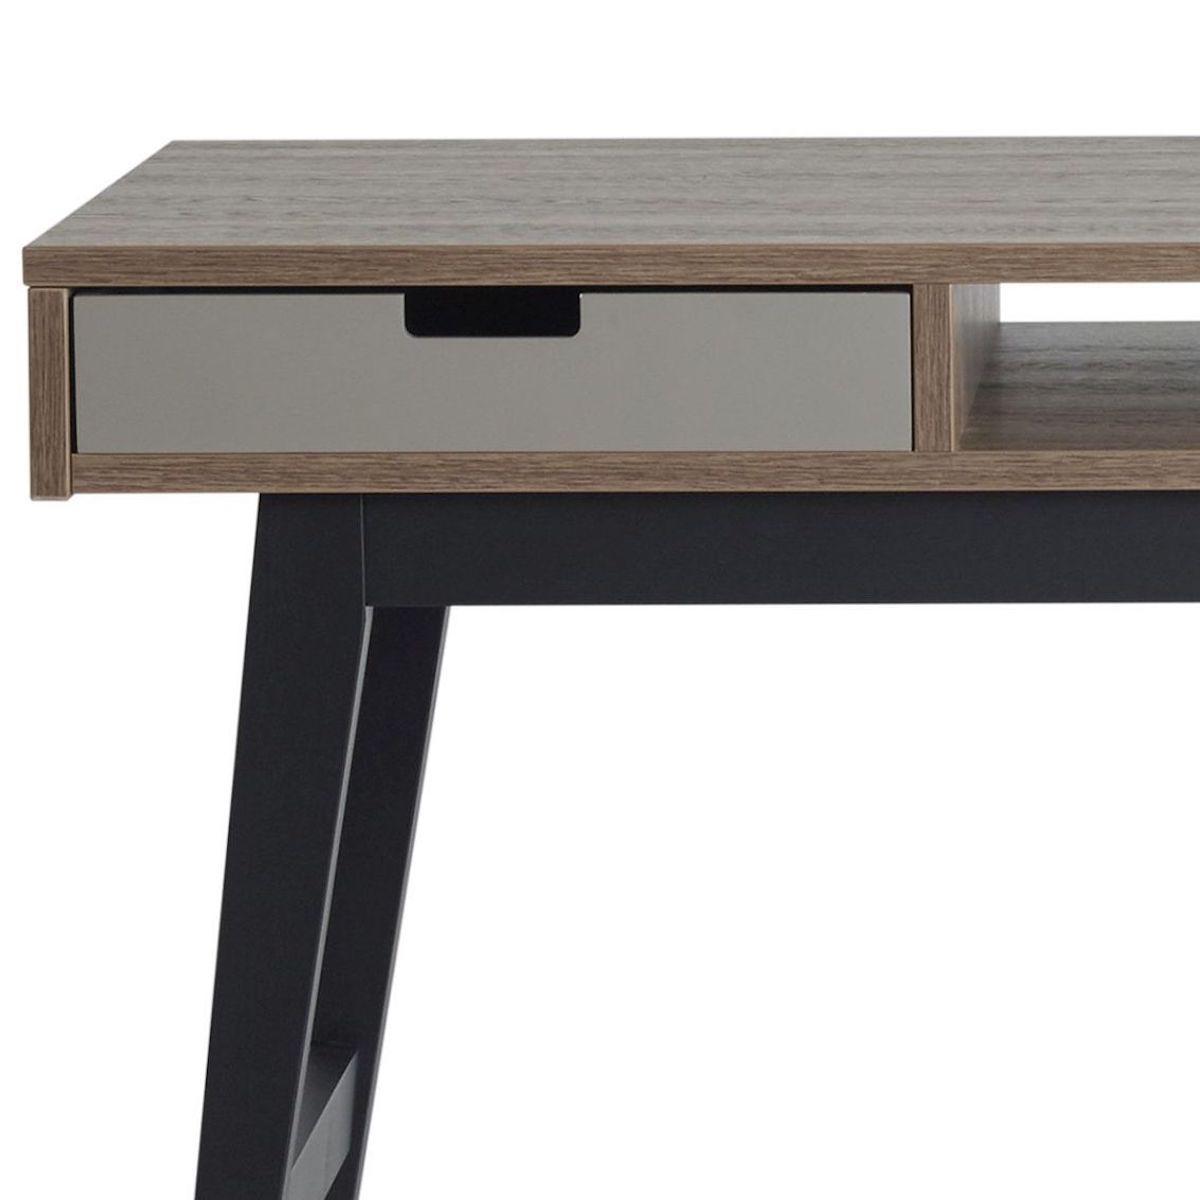 Cajón escritorio-mesita de noche TRENDY Quax royal oak